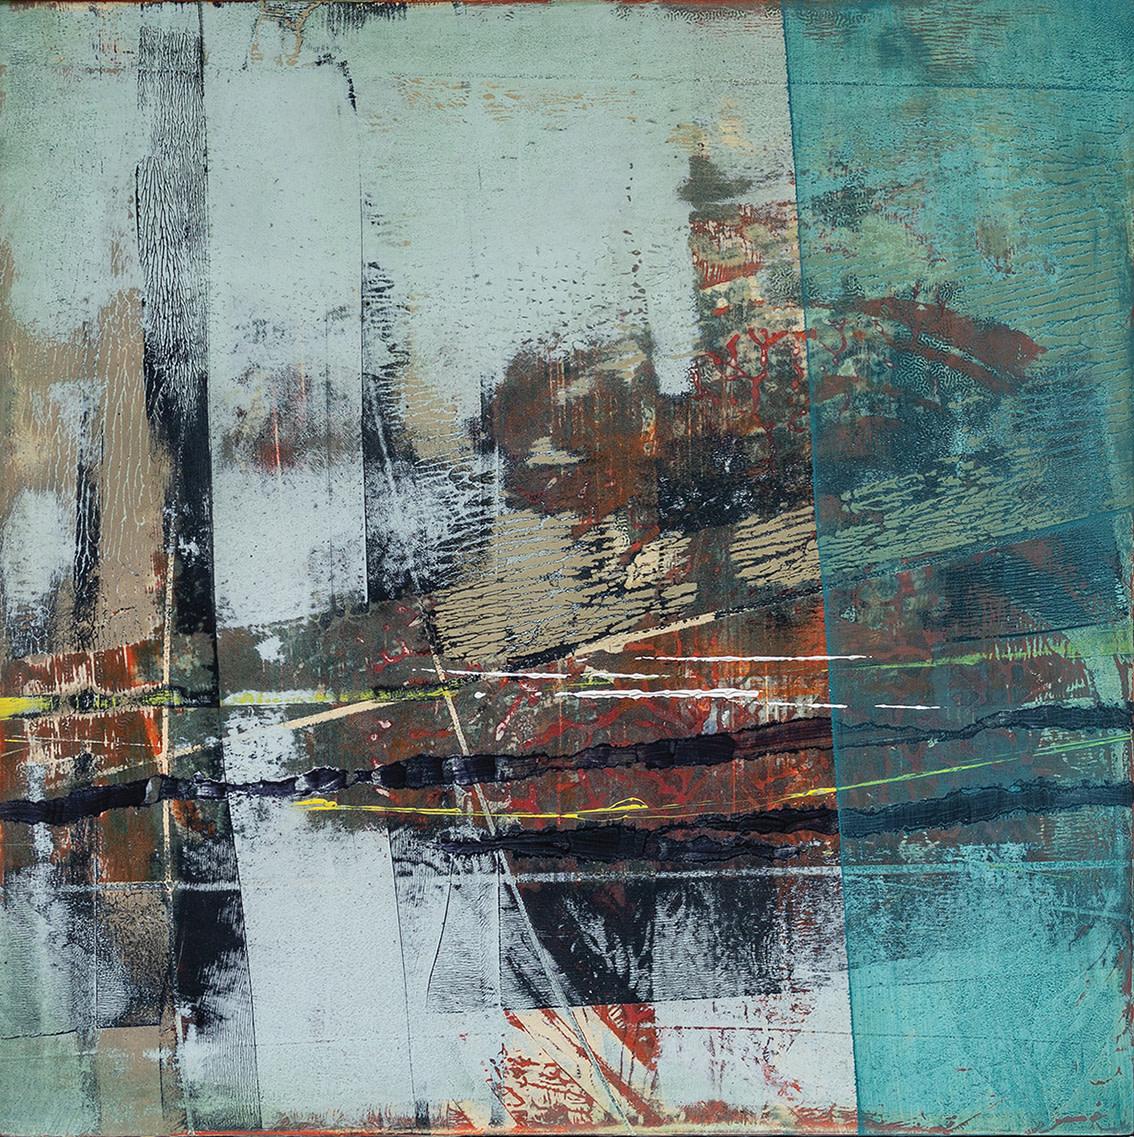 <span class=&#34;link fancybox-details-link&#34;><a href=&#34;/artists/218-ian-harrold/works/6076-ian-harrold-homecoming-2018/&#34;>View Detail Page</a></span><div class=&#34;artist&#34;><strong>Ian Harrold</strong></div> <div class=&#34;title&#34;><em>Homecoming</em>, 2018</div> <div class=&#34;signed_and_dated&#34;>signed on reverse</div> <div class=&#34;medium&#34;>oil on board</div> <div class=&#34;dimensions&#34;>h 30 x w 30 cm<br /> 11 3/4 x 11 3/4 in</div><div class=&#34;copyright_line&#34;>OwnArt: £ 40 x 10 Months, 0% APR </div>